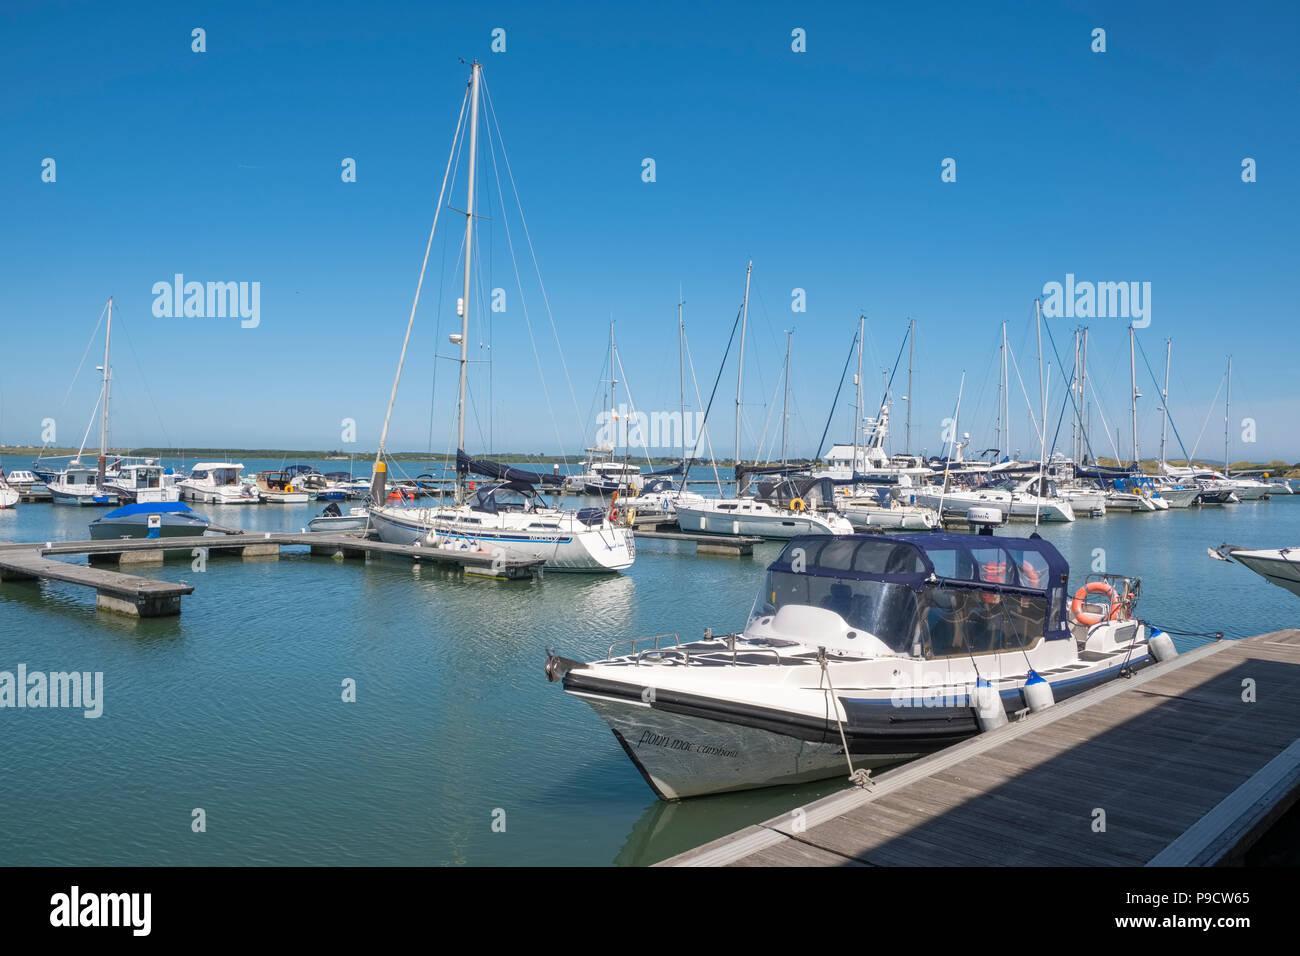 Malahide Marina, Malahide, Dublin, Ireland, Europe - Stock Image